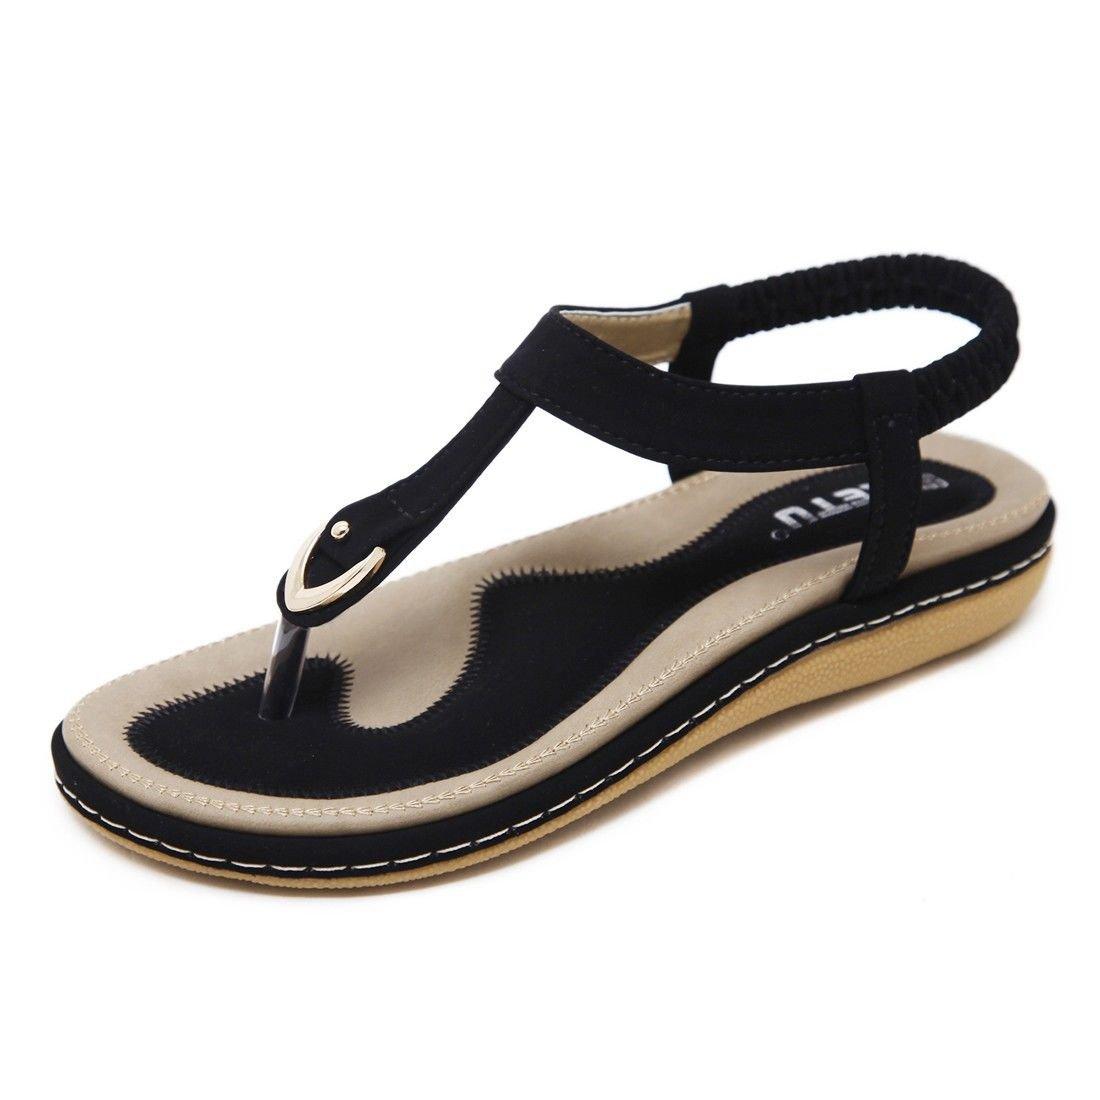 AIKAKA Damenschuhe Fruuml;hling Sommer Groszlig;e Student Studded Flachen Sandalen  37 EU|Black